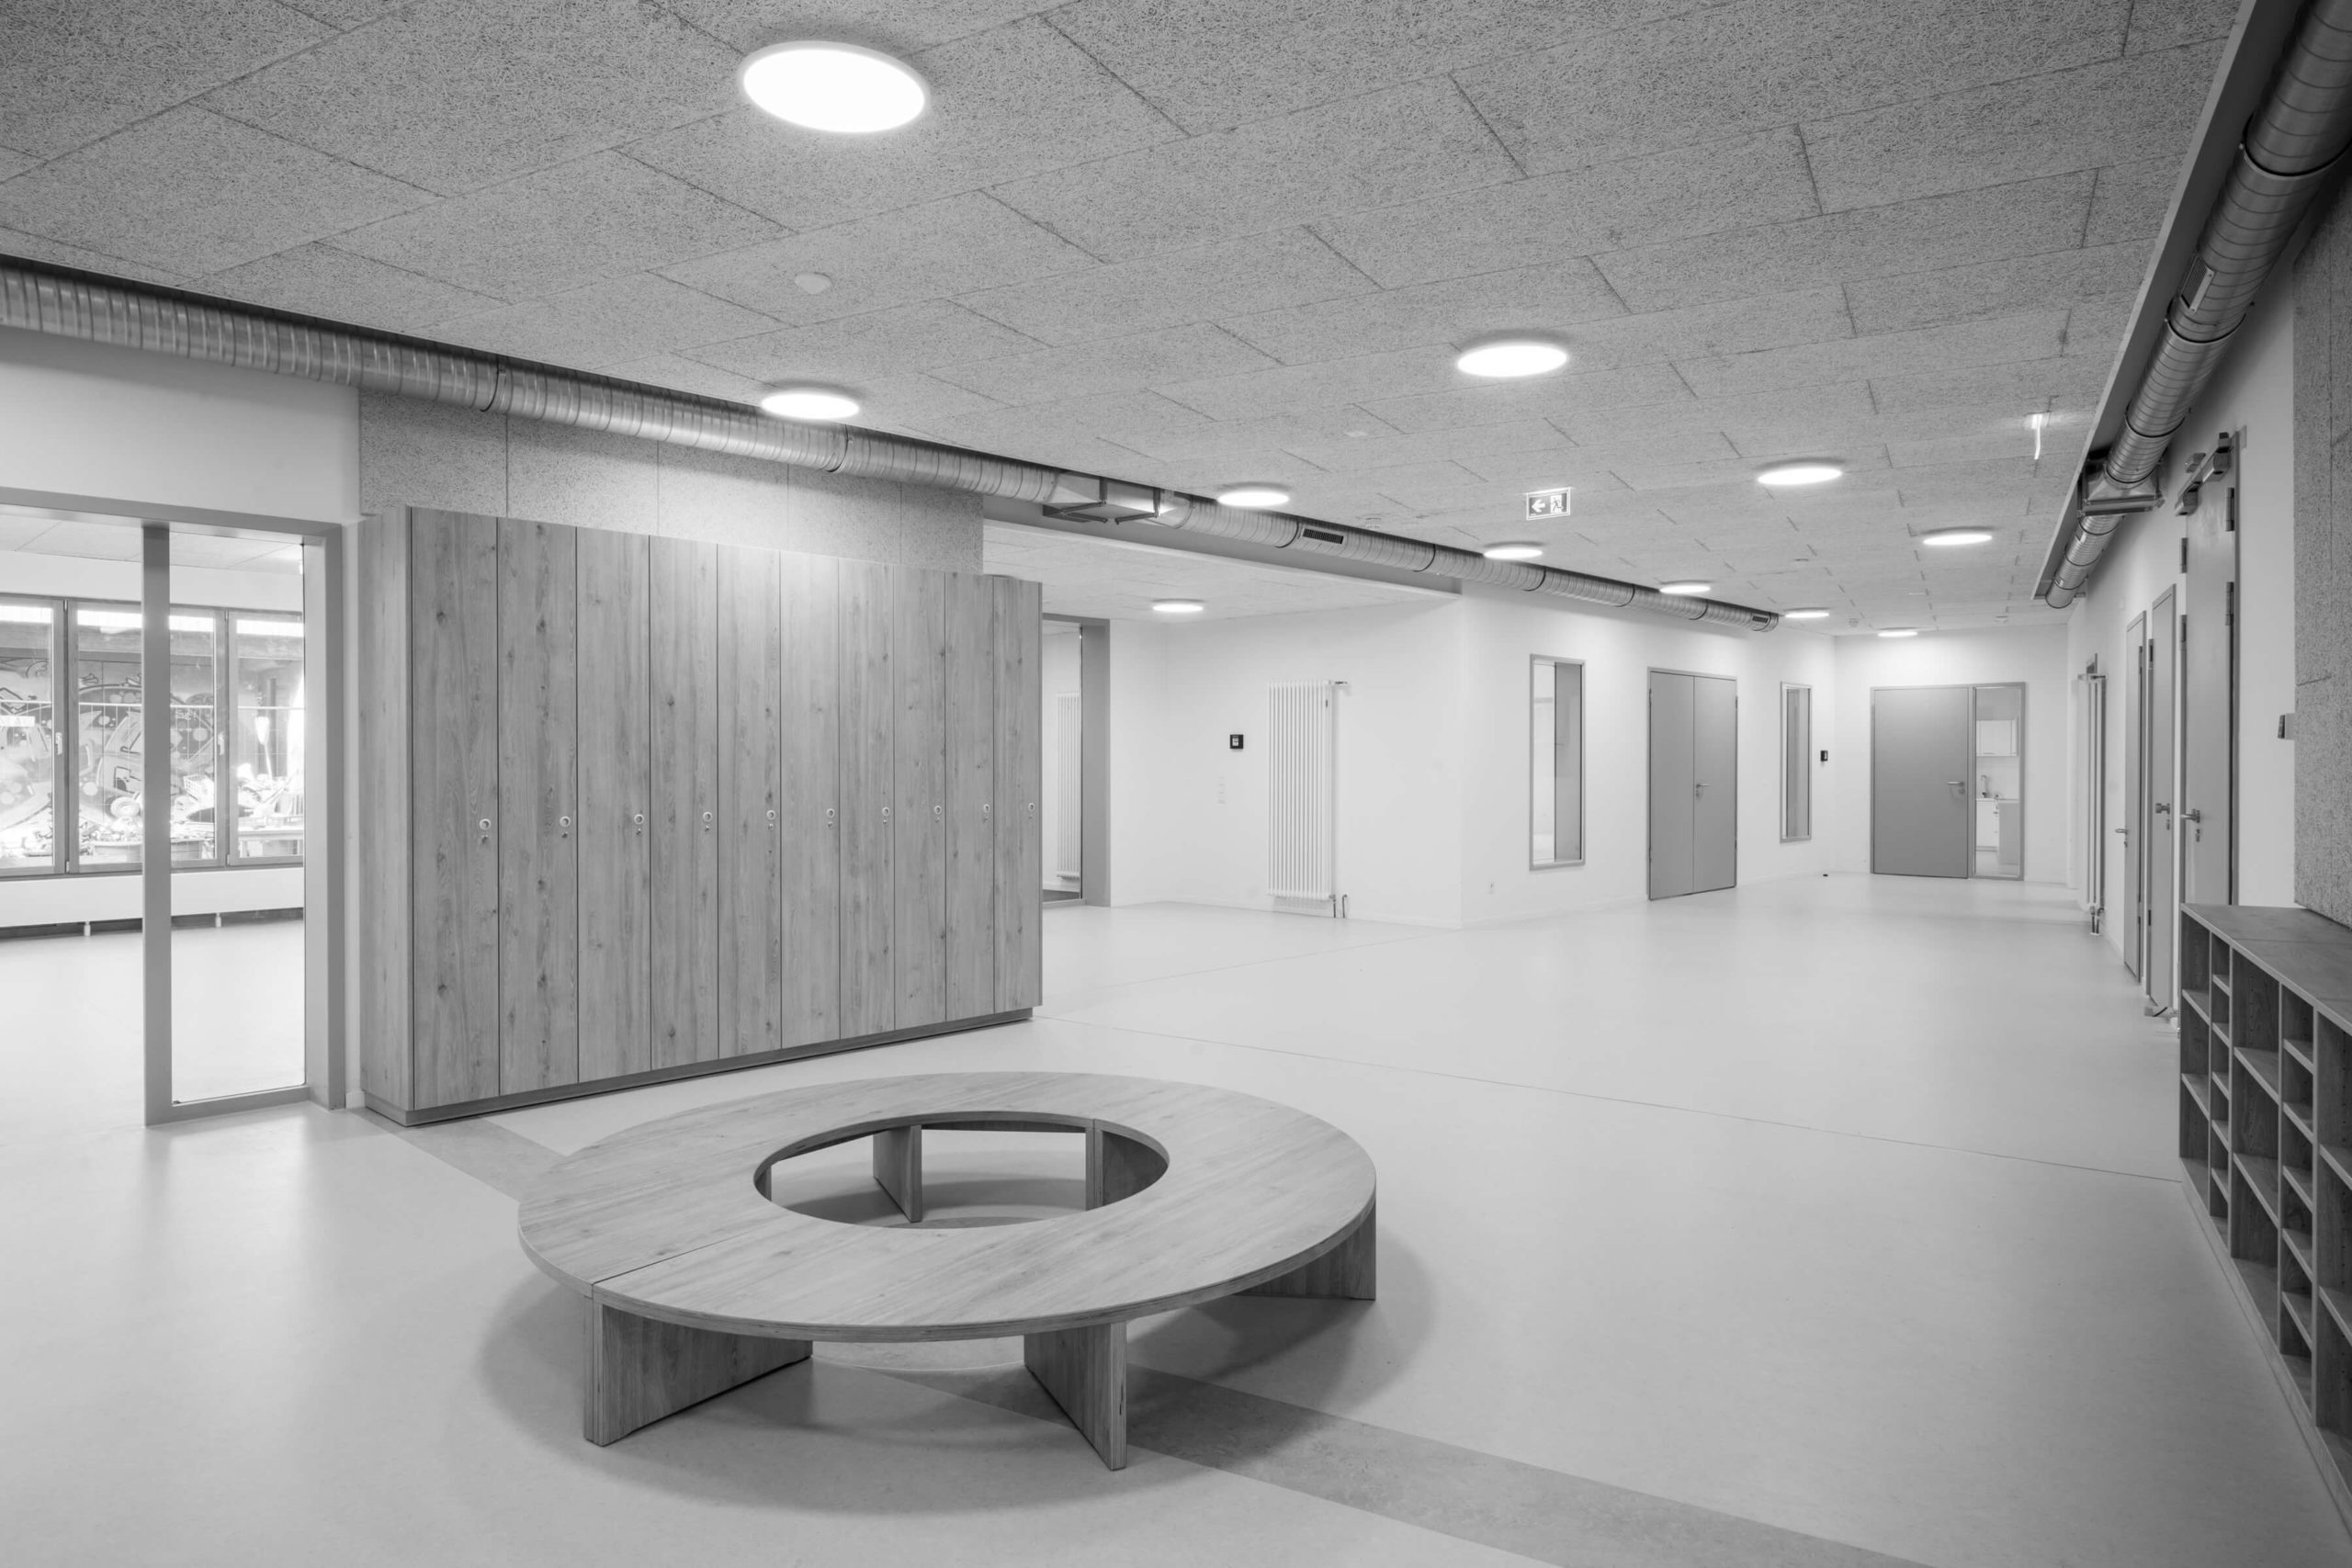 Kindertagesstätte Johannes - Norderstedt